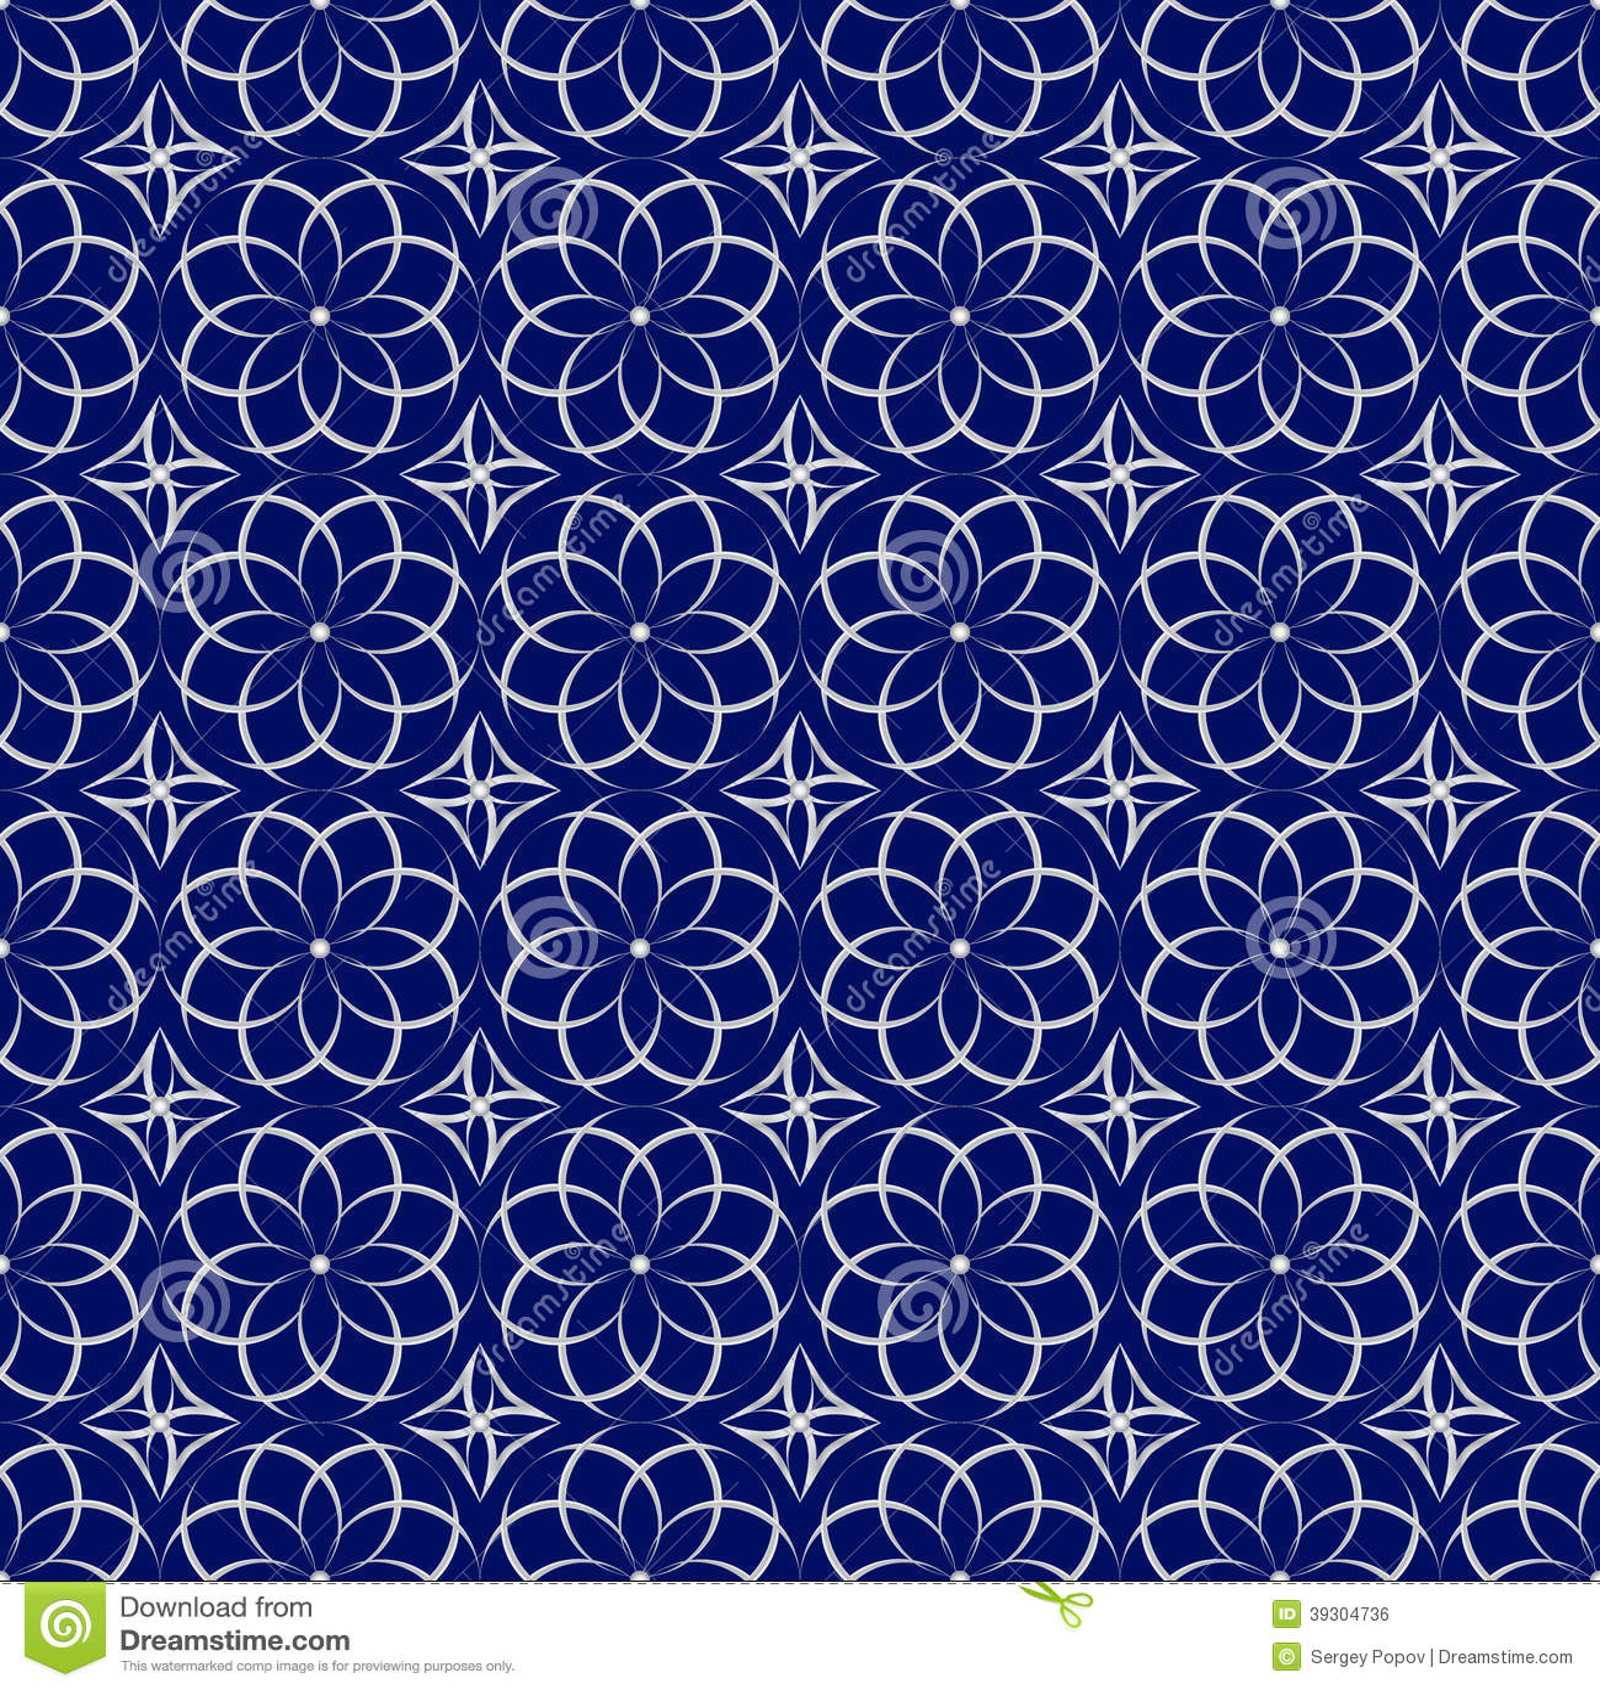 250 Free Distinct Geometric Patterns  Naldz Graphics